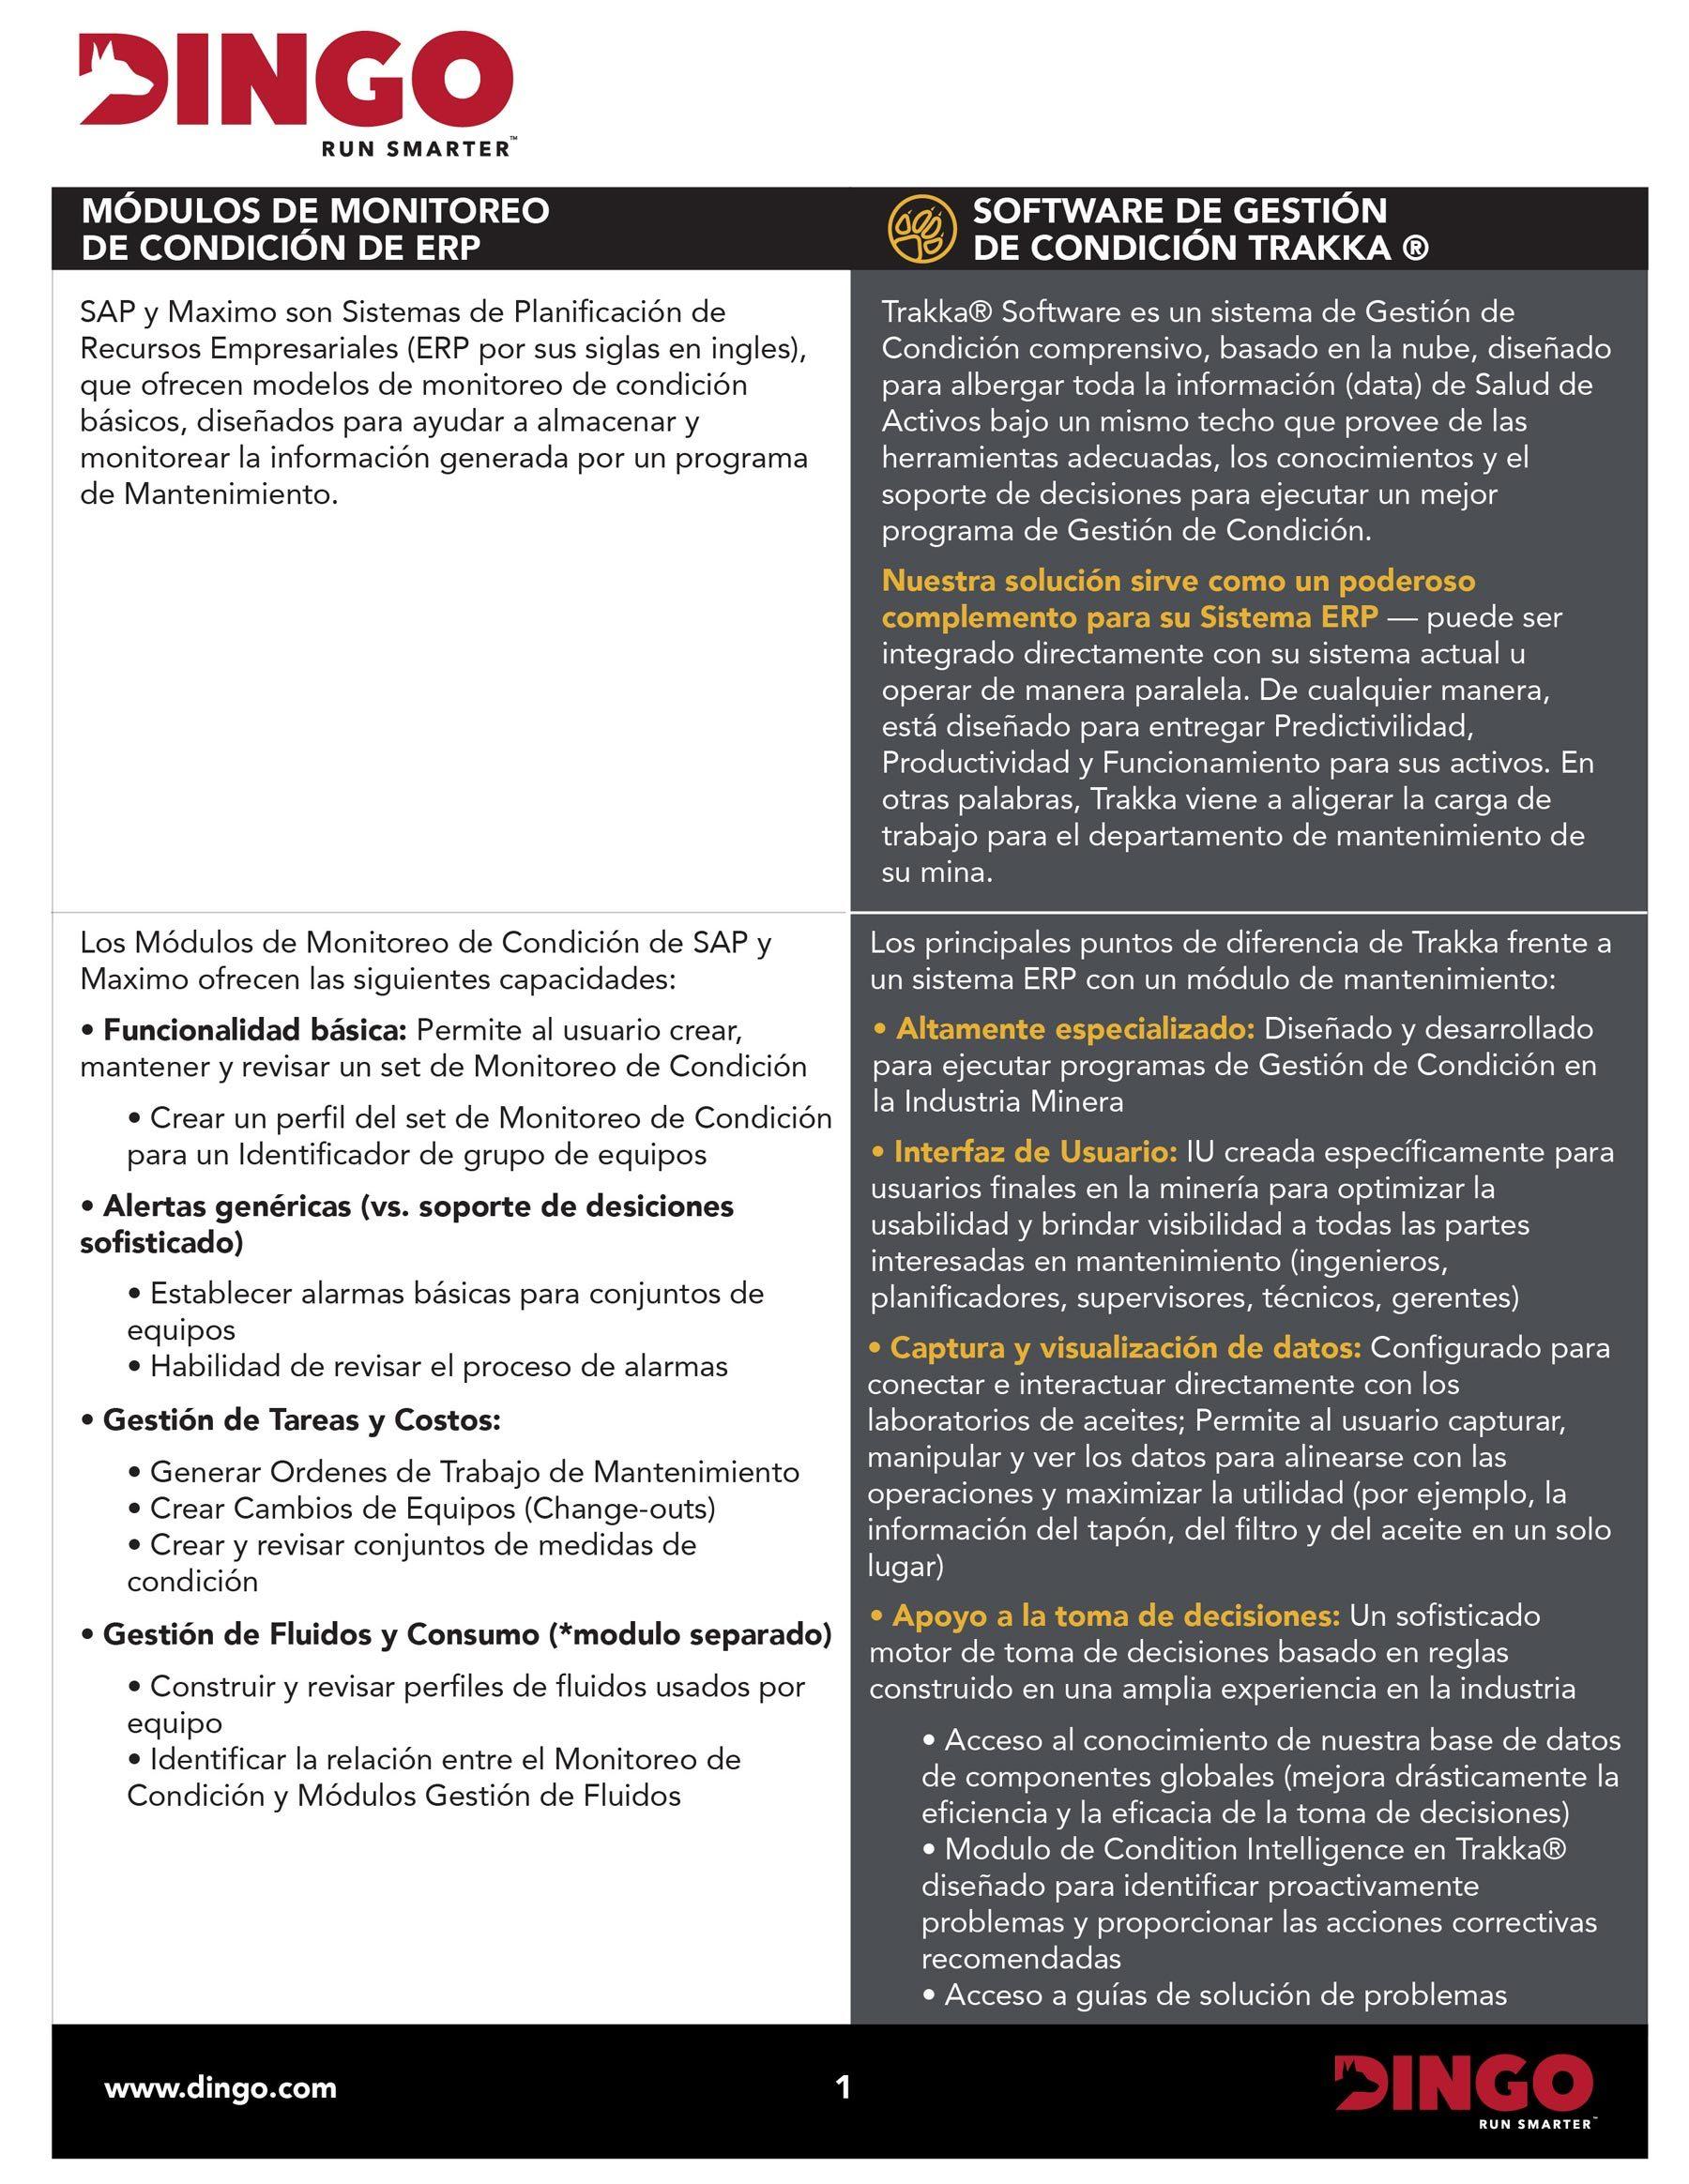 1.Diferencias_ERP-TRAKKA-01